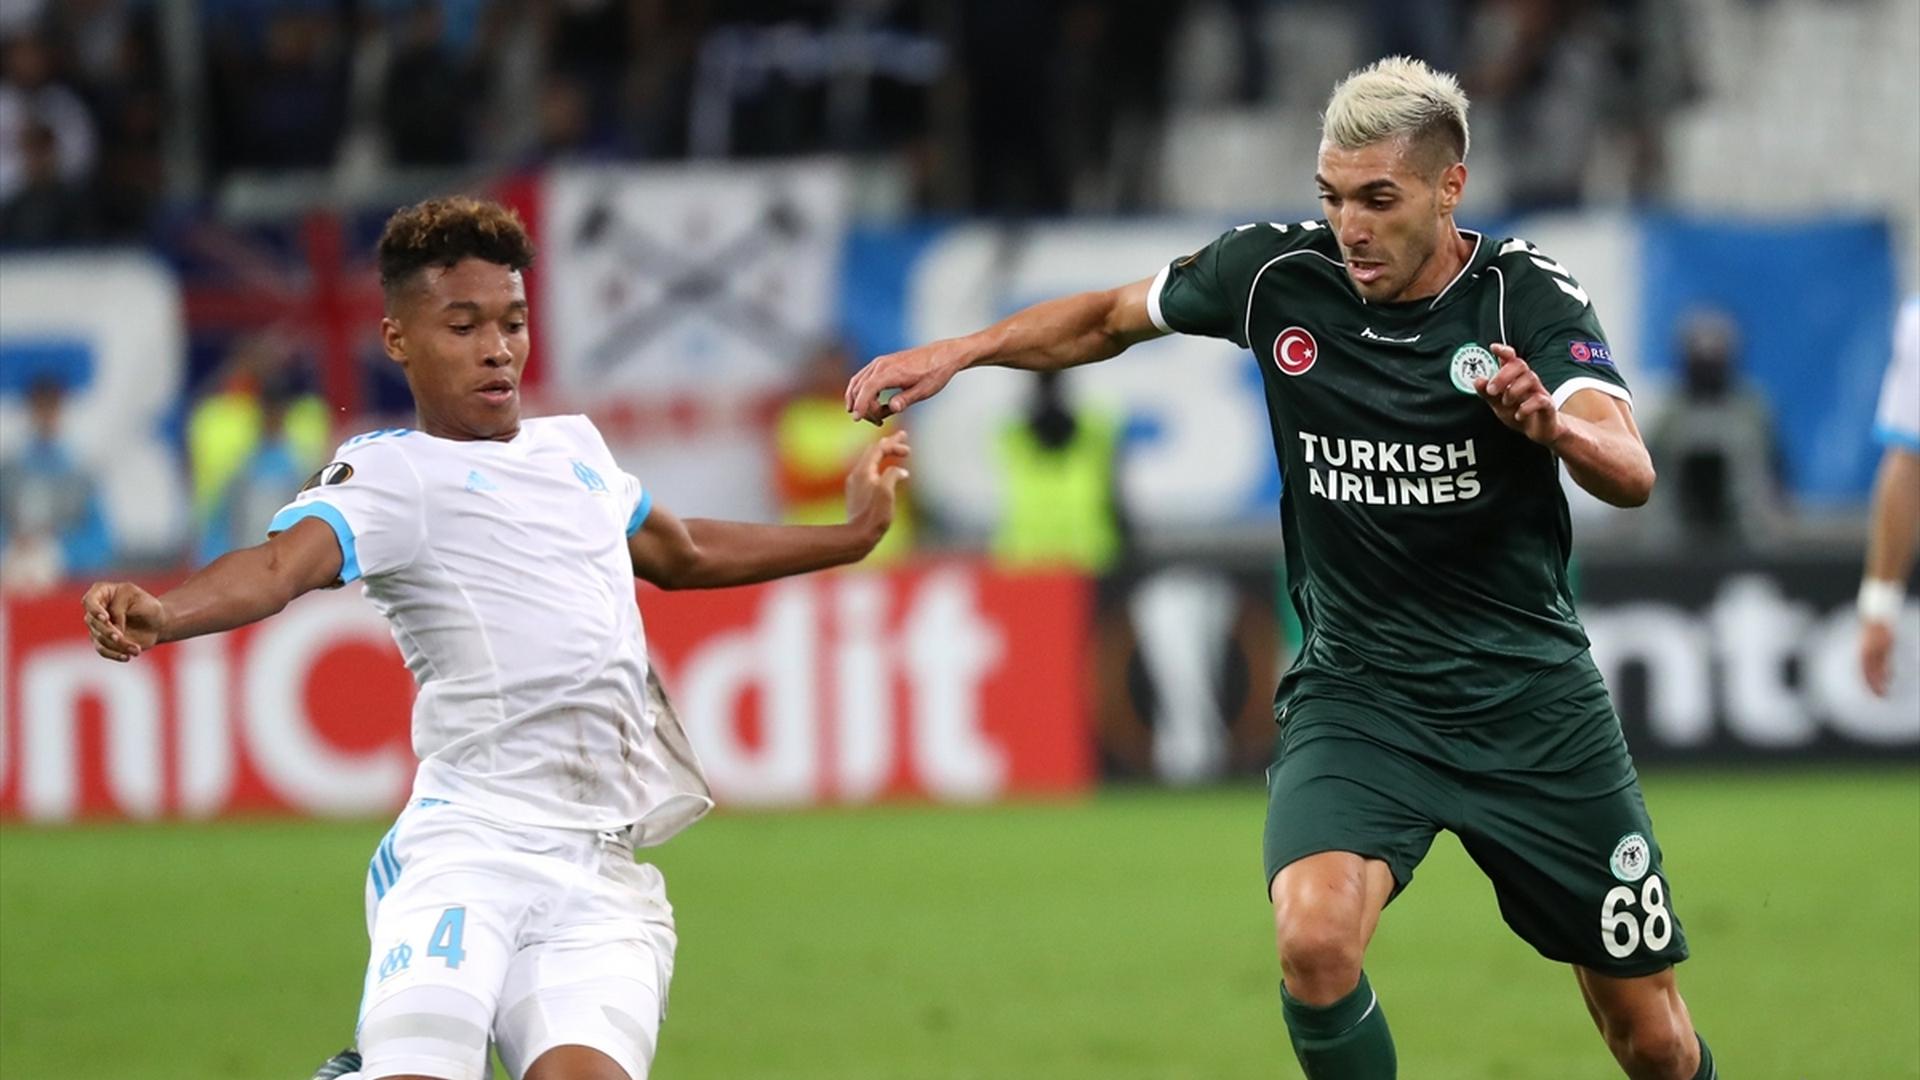 OM - Formé à Marseille, Boubacar Kamara brûle les étapes   Goal.com